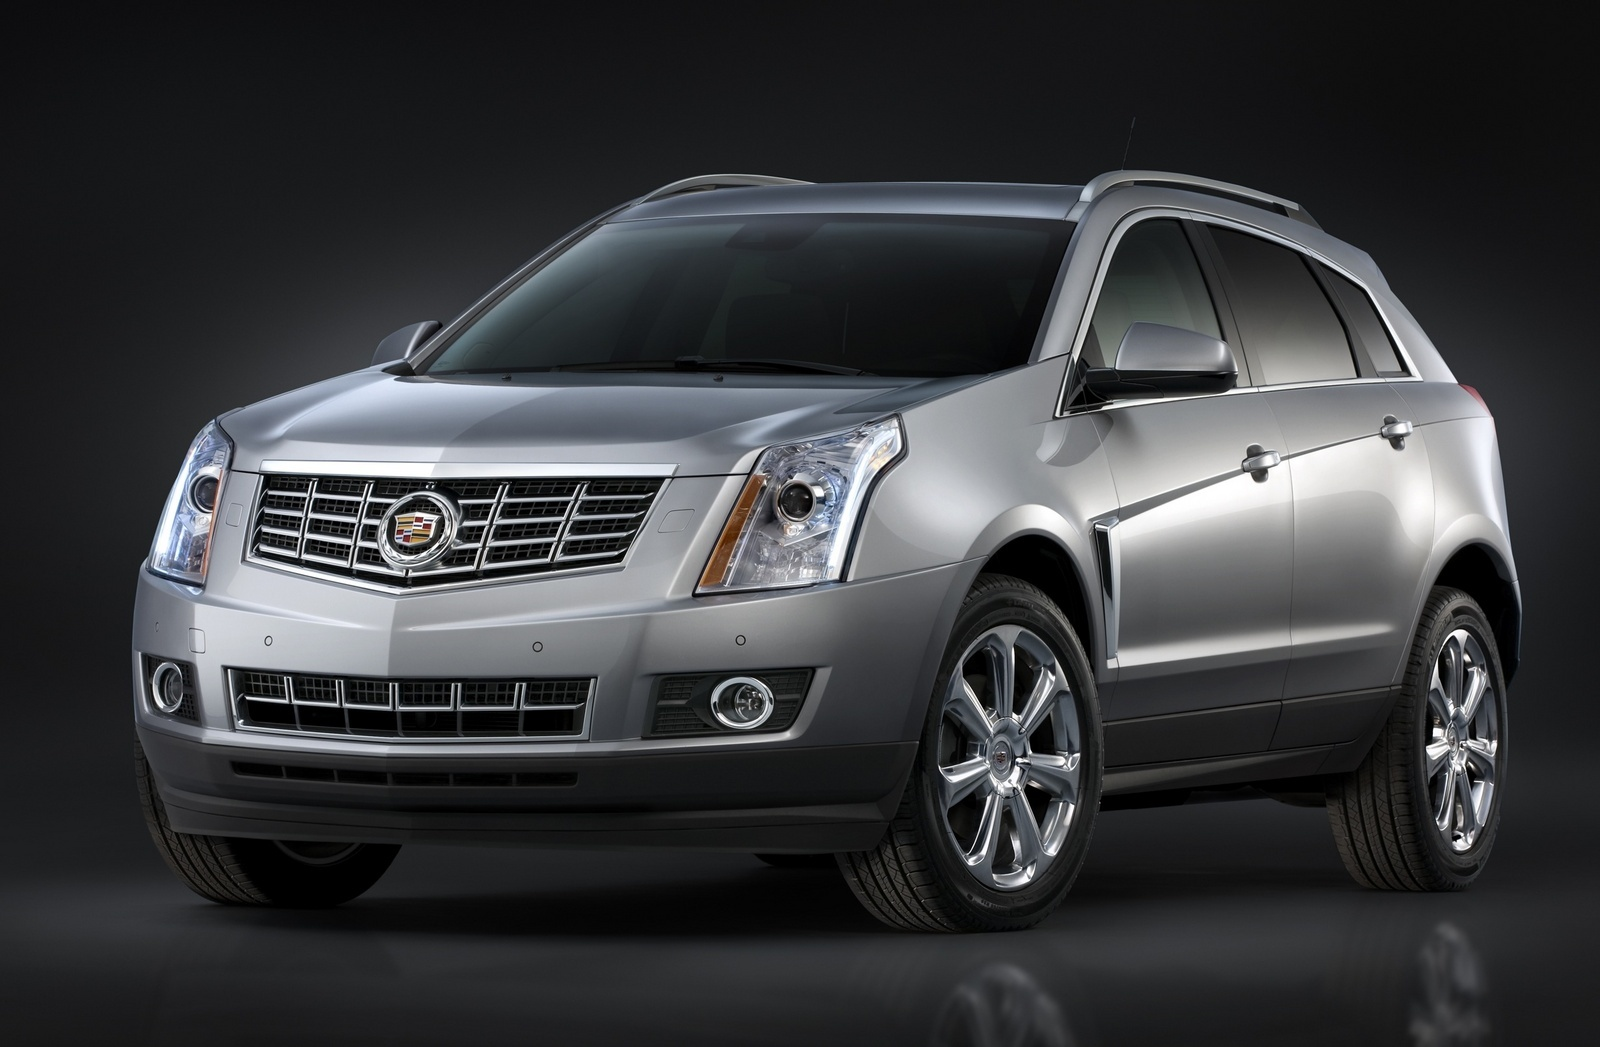 2015 Cadillac SRX - Overview - CarGurus